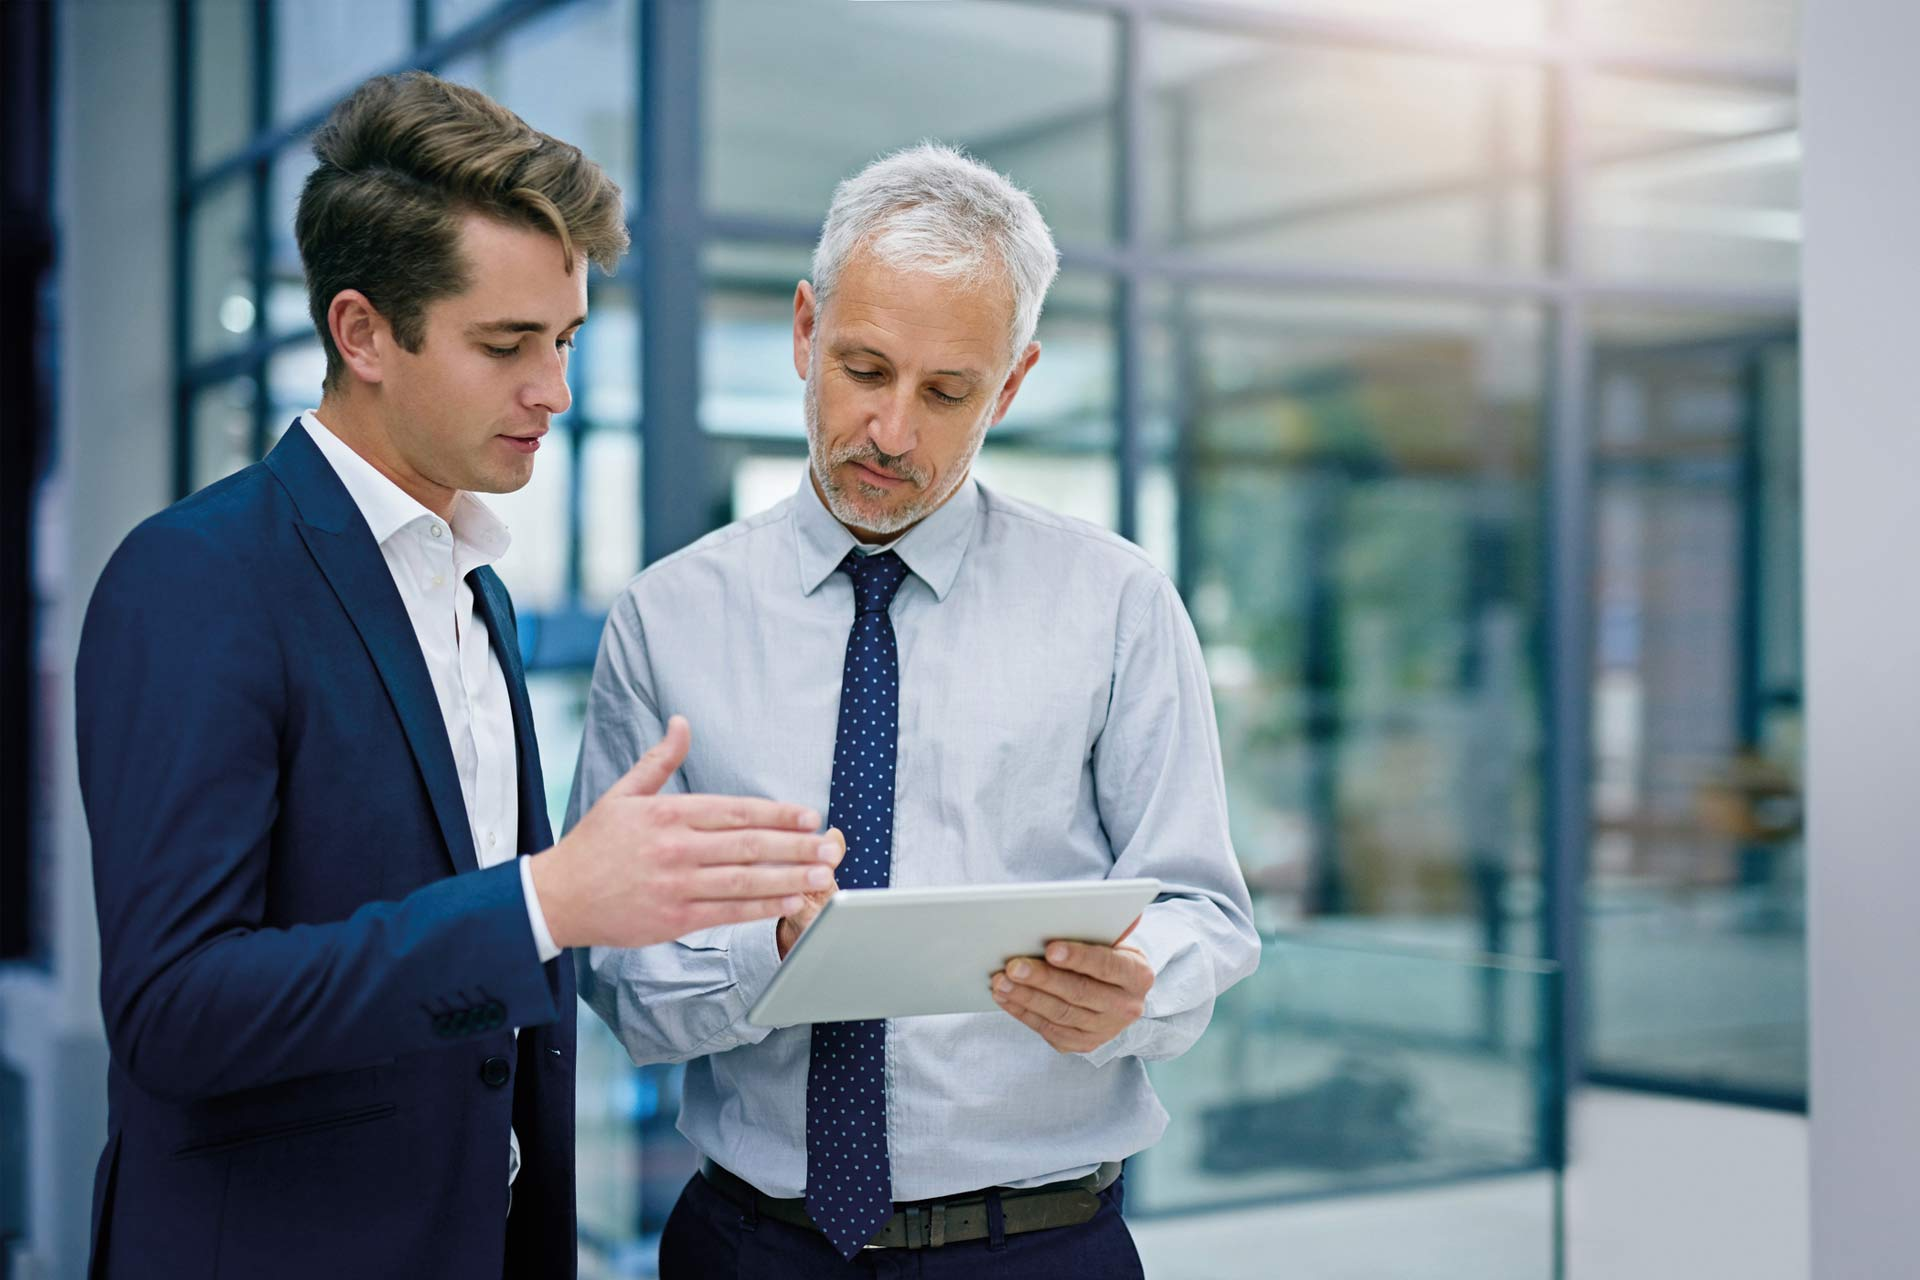 Advanced Ledger Accounting